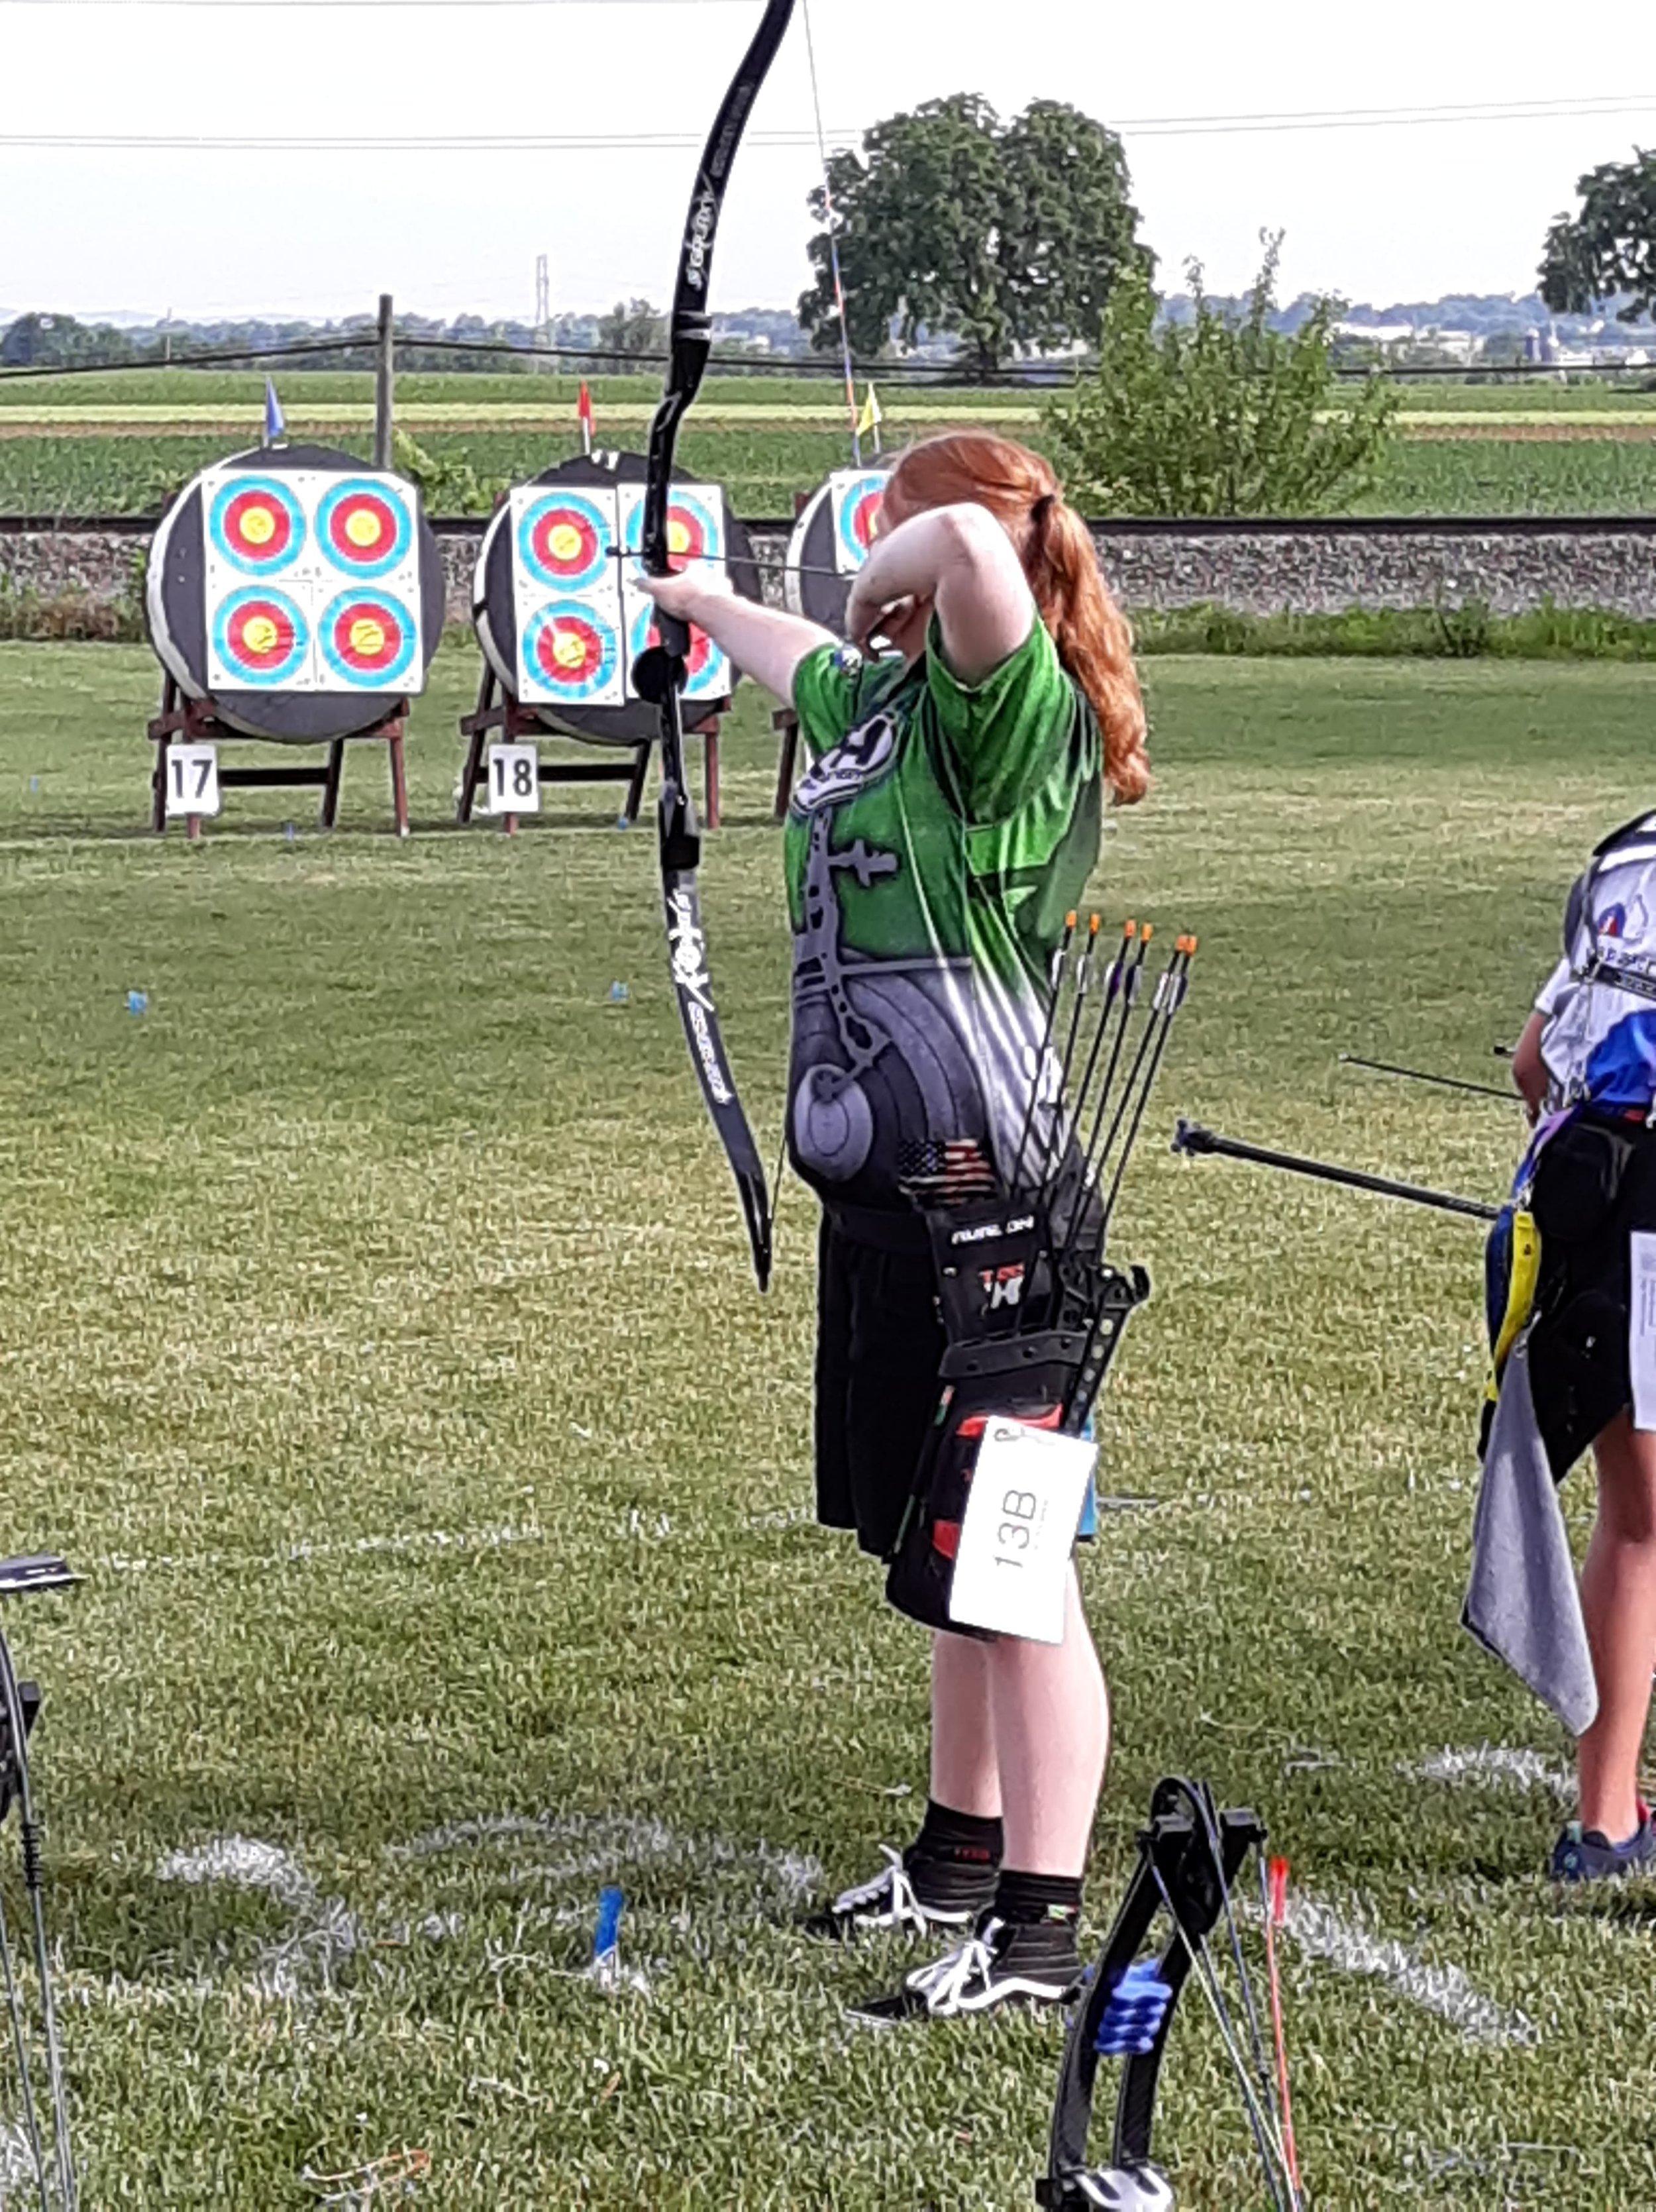 fita-archery-world-archery-barebow.jpg